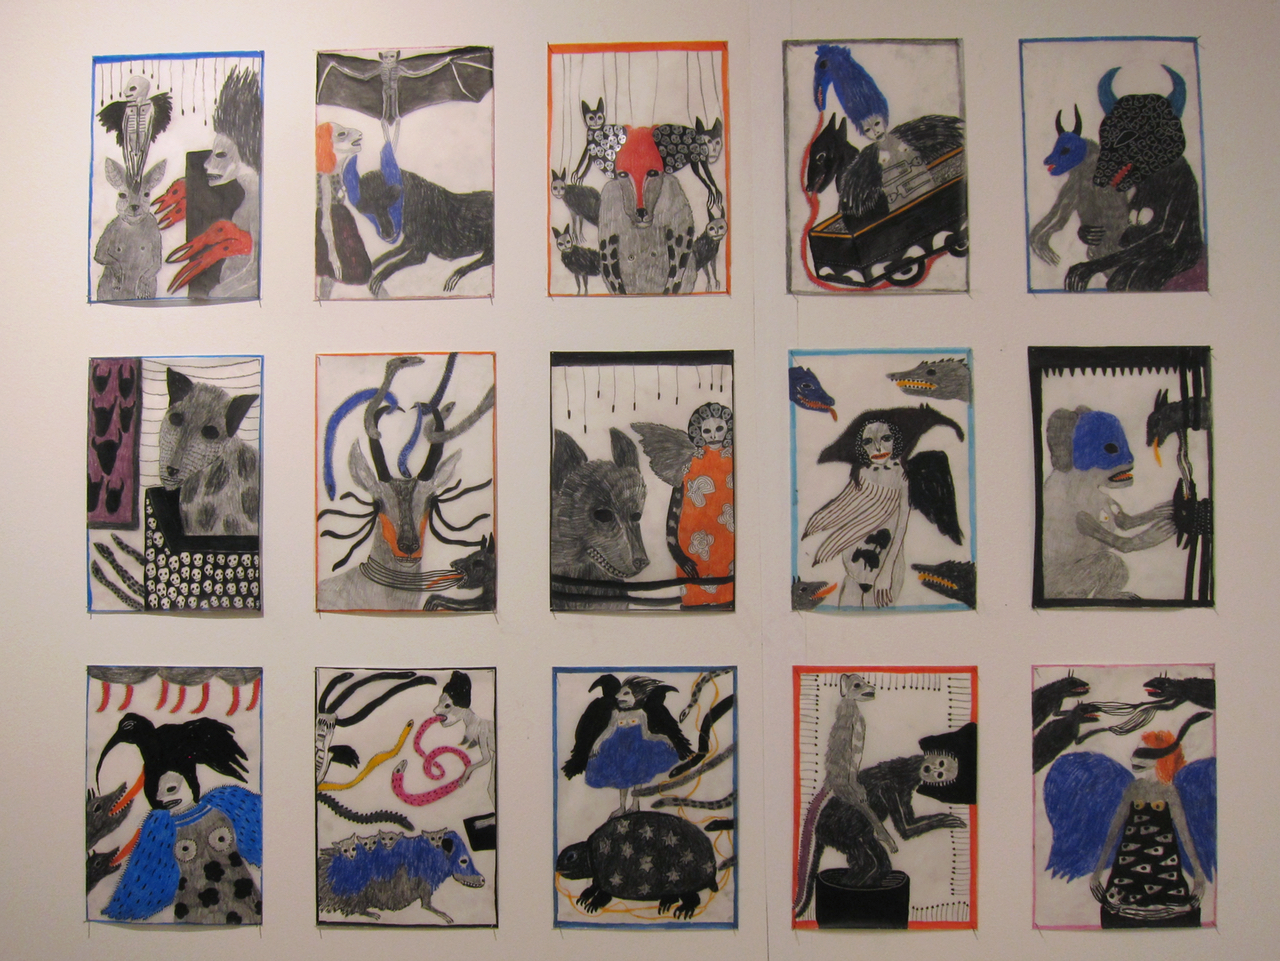 Drawings by Annette Barcelo at Galerie Anne de Villepoix